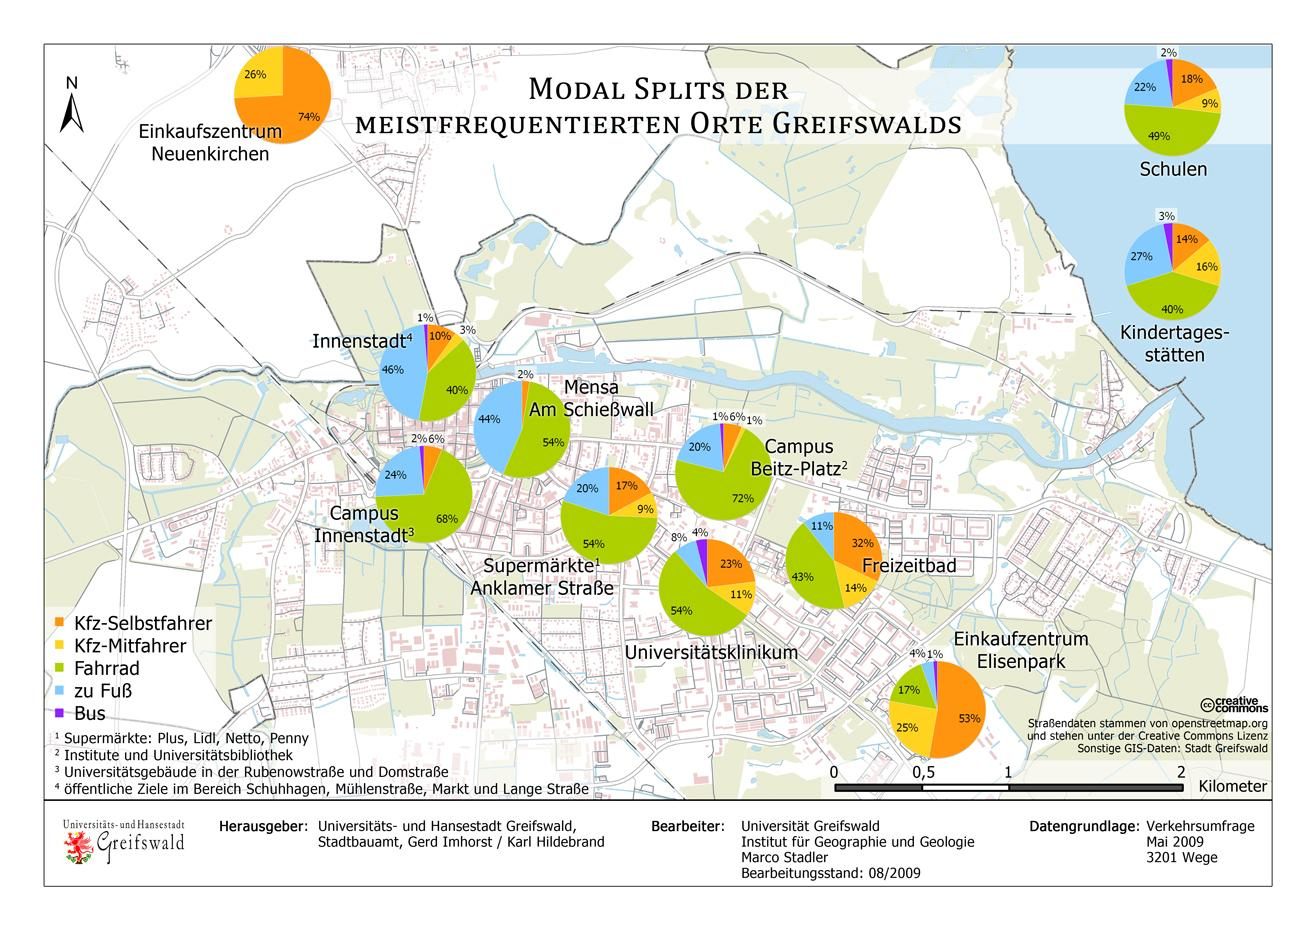 Untersuchung des Modal Splits in Greifswald